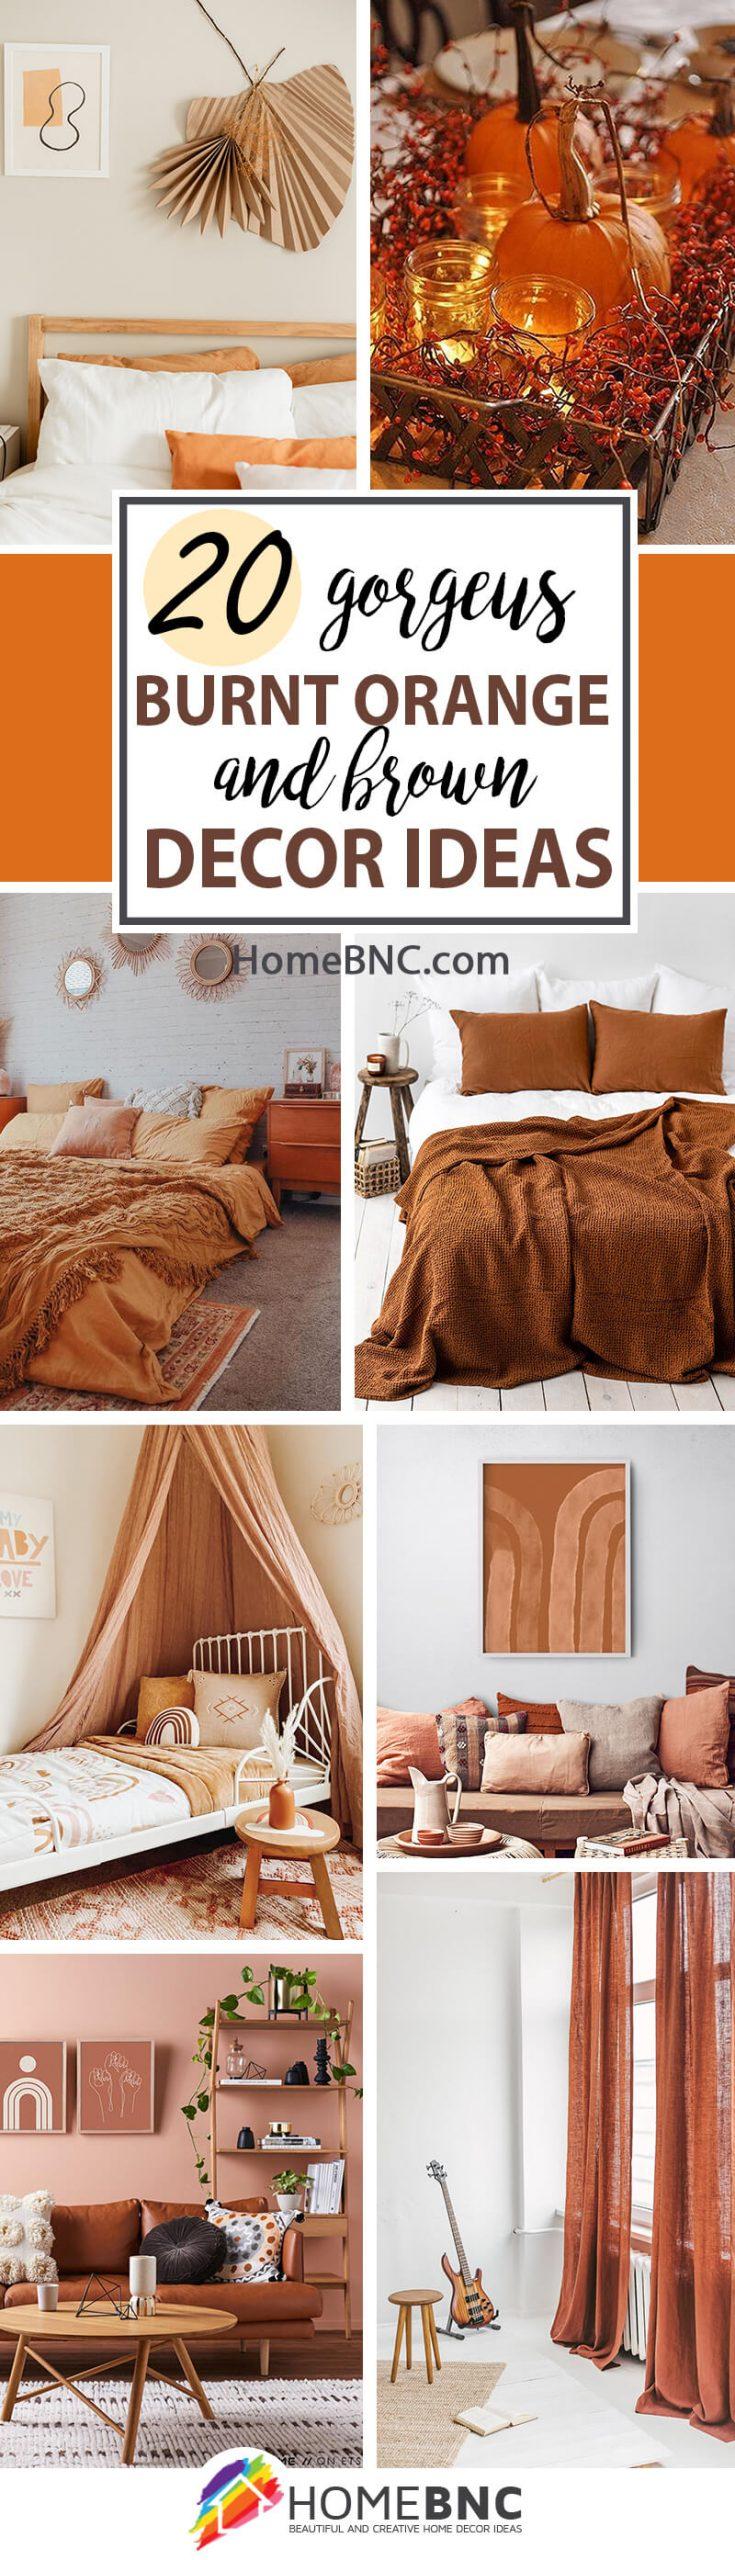 Burnt Orange And Brown Home Decor Ideas, Burnt Orange Living Room Accessories